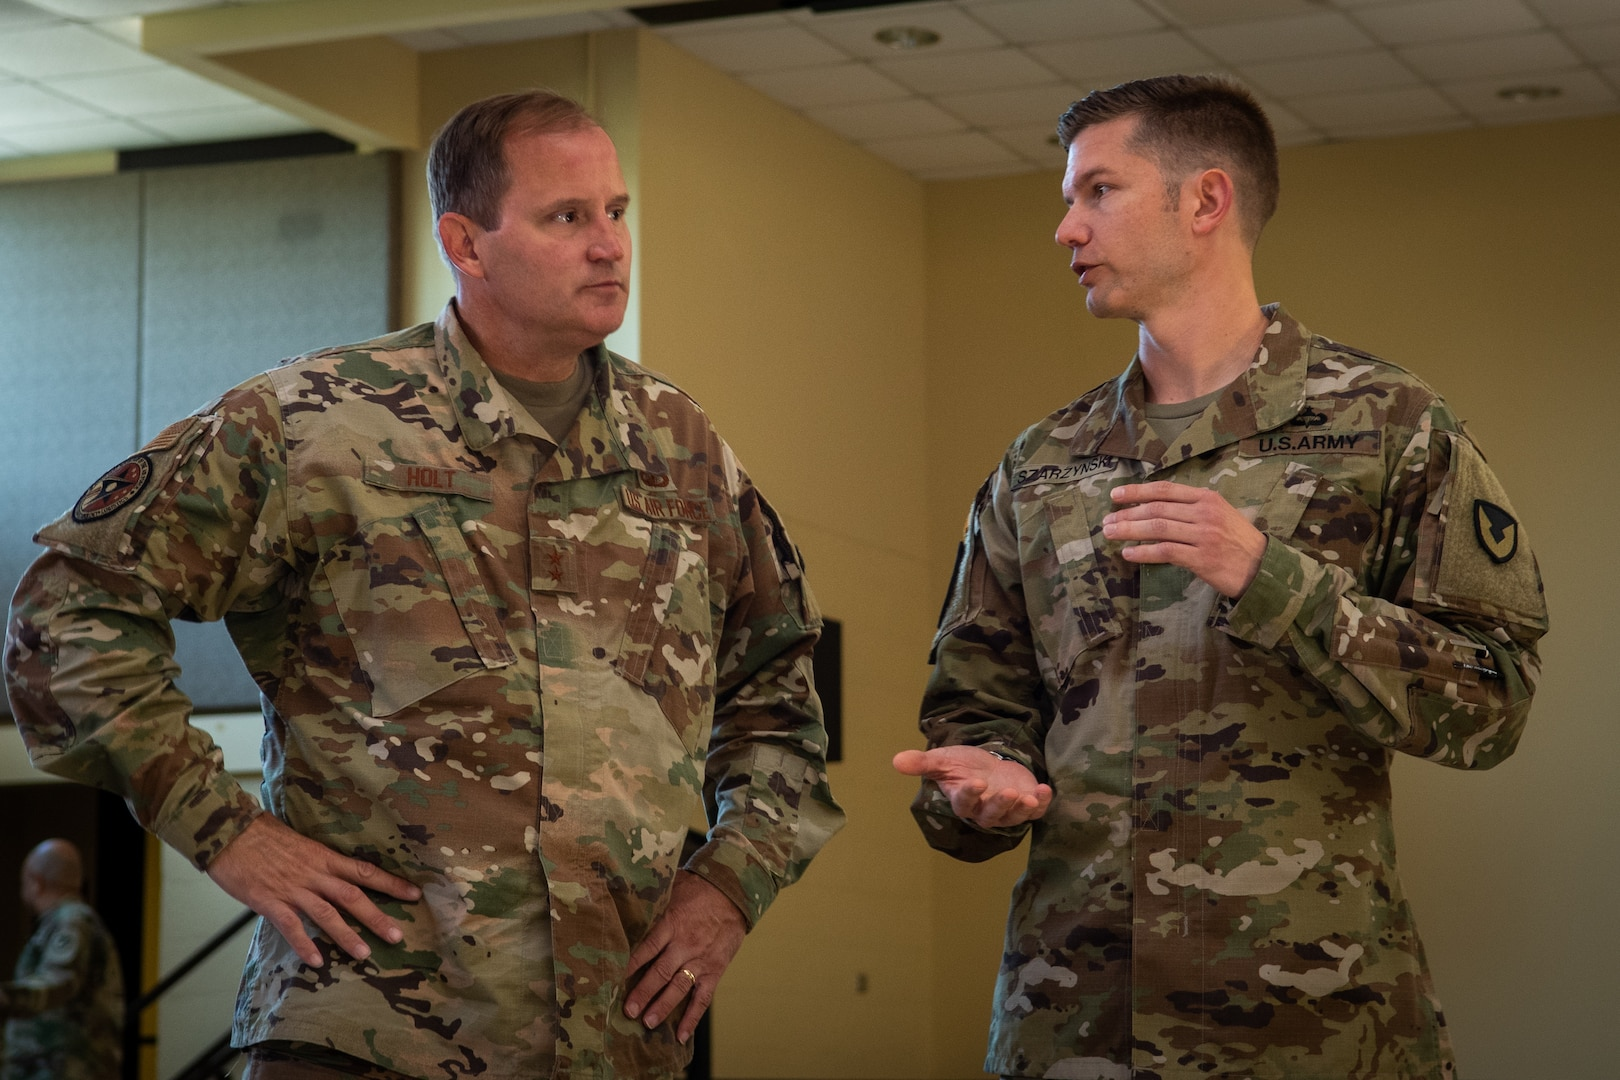 Air Force Maj. Gen. Cameron Holt talks with Army Maj. Matthew Szarzynski